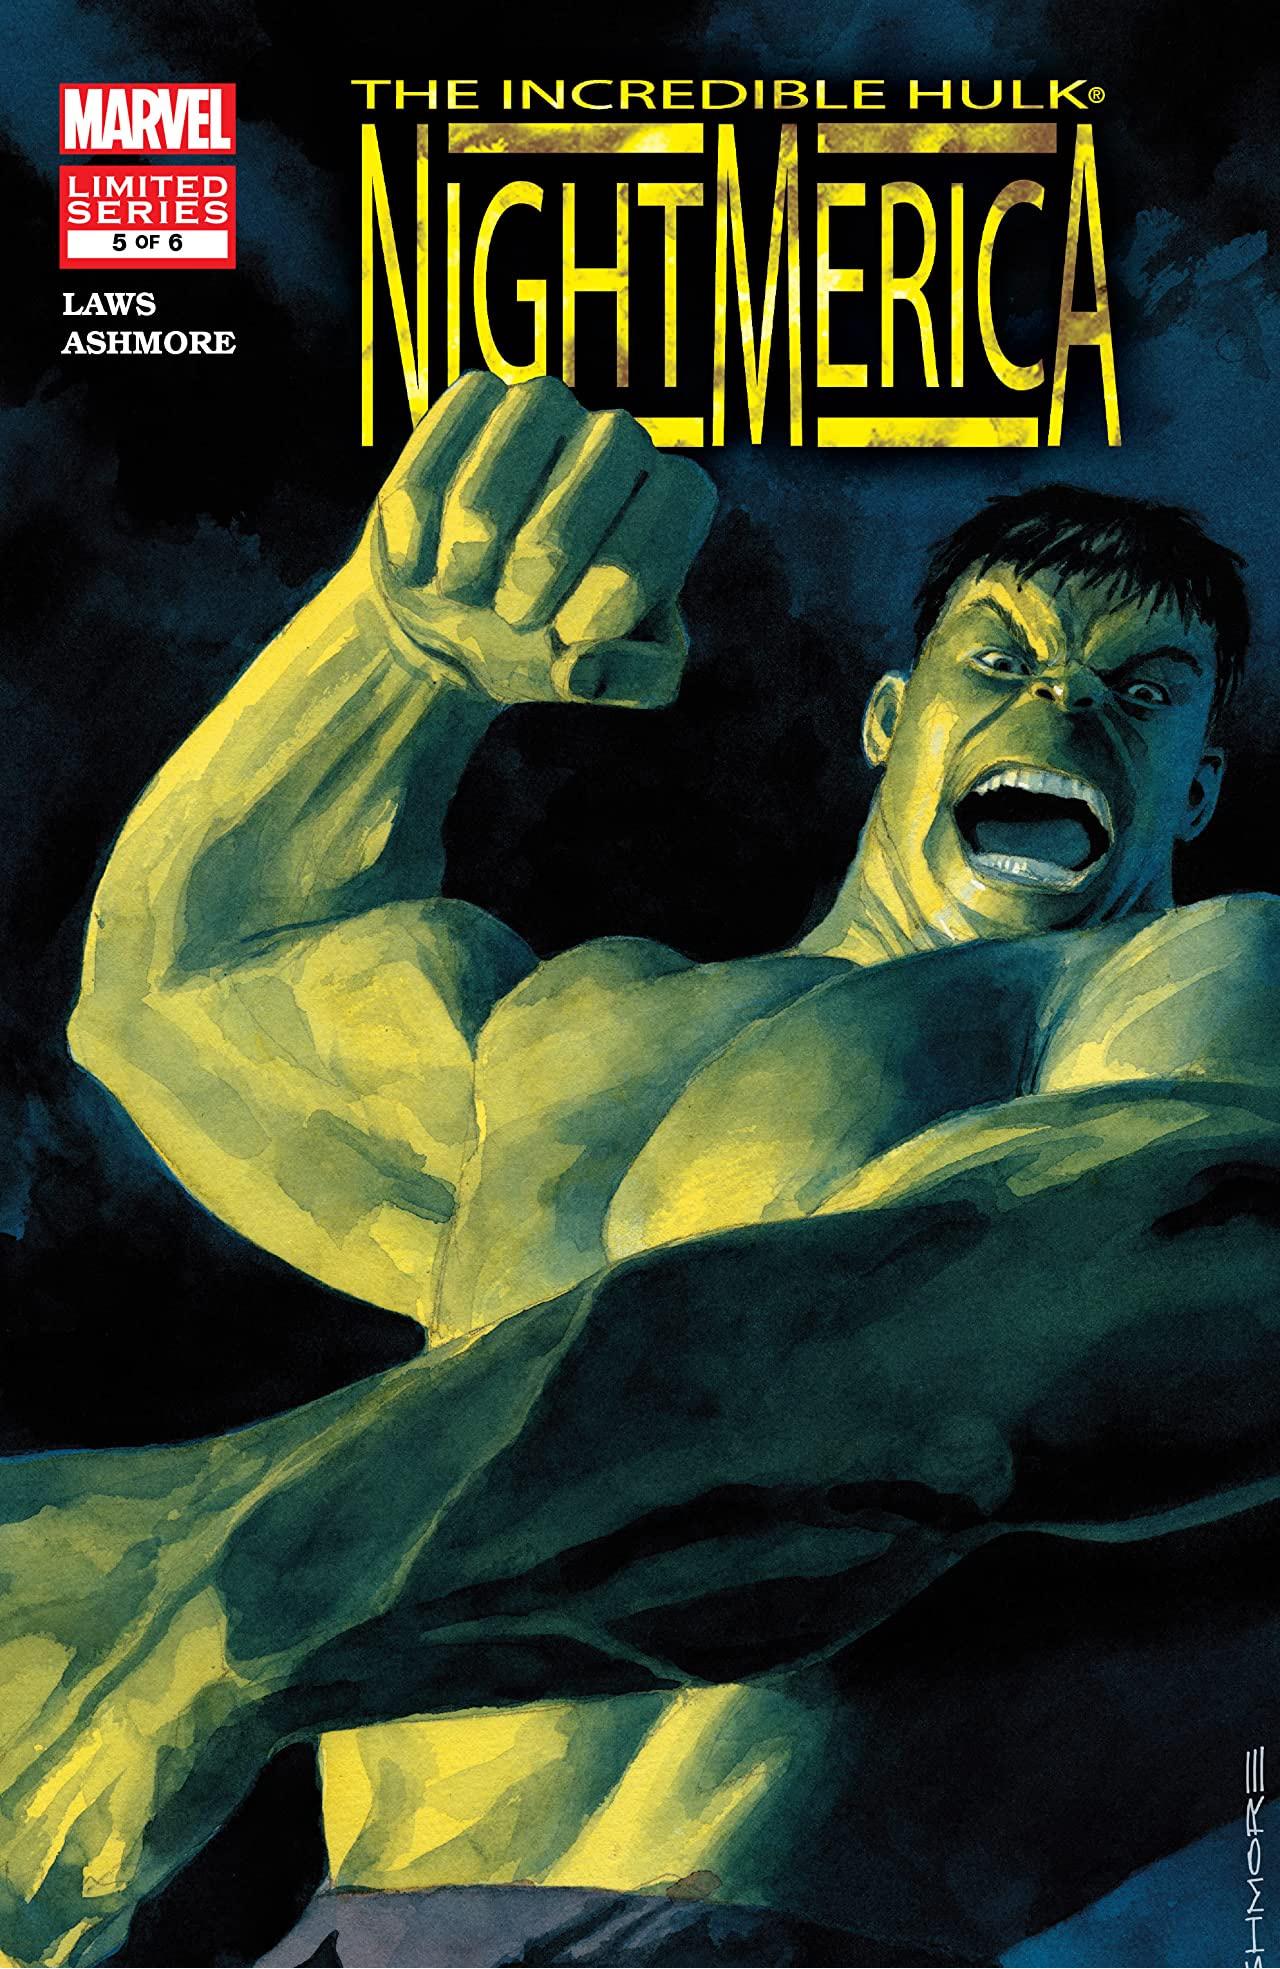 Hulk: Nightmerica Vol 1 5